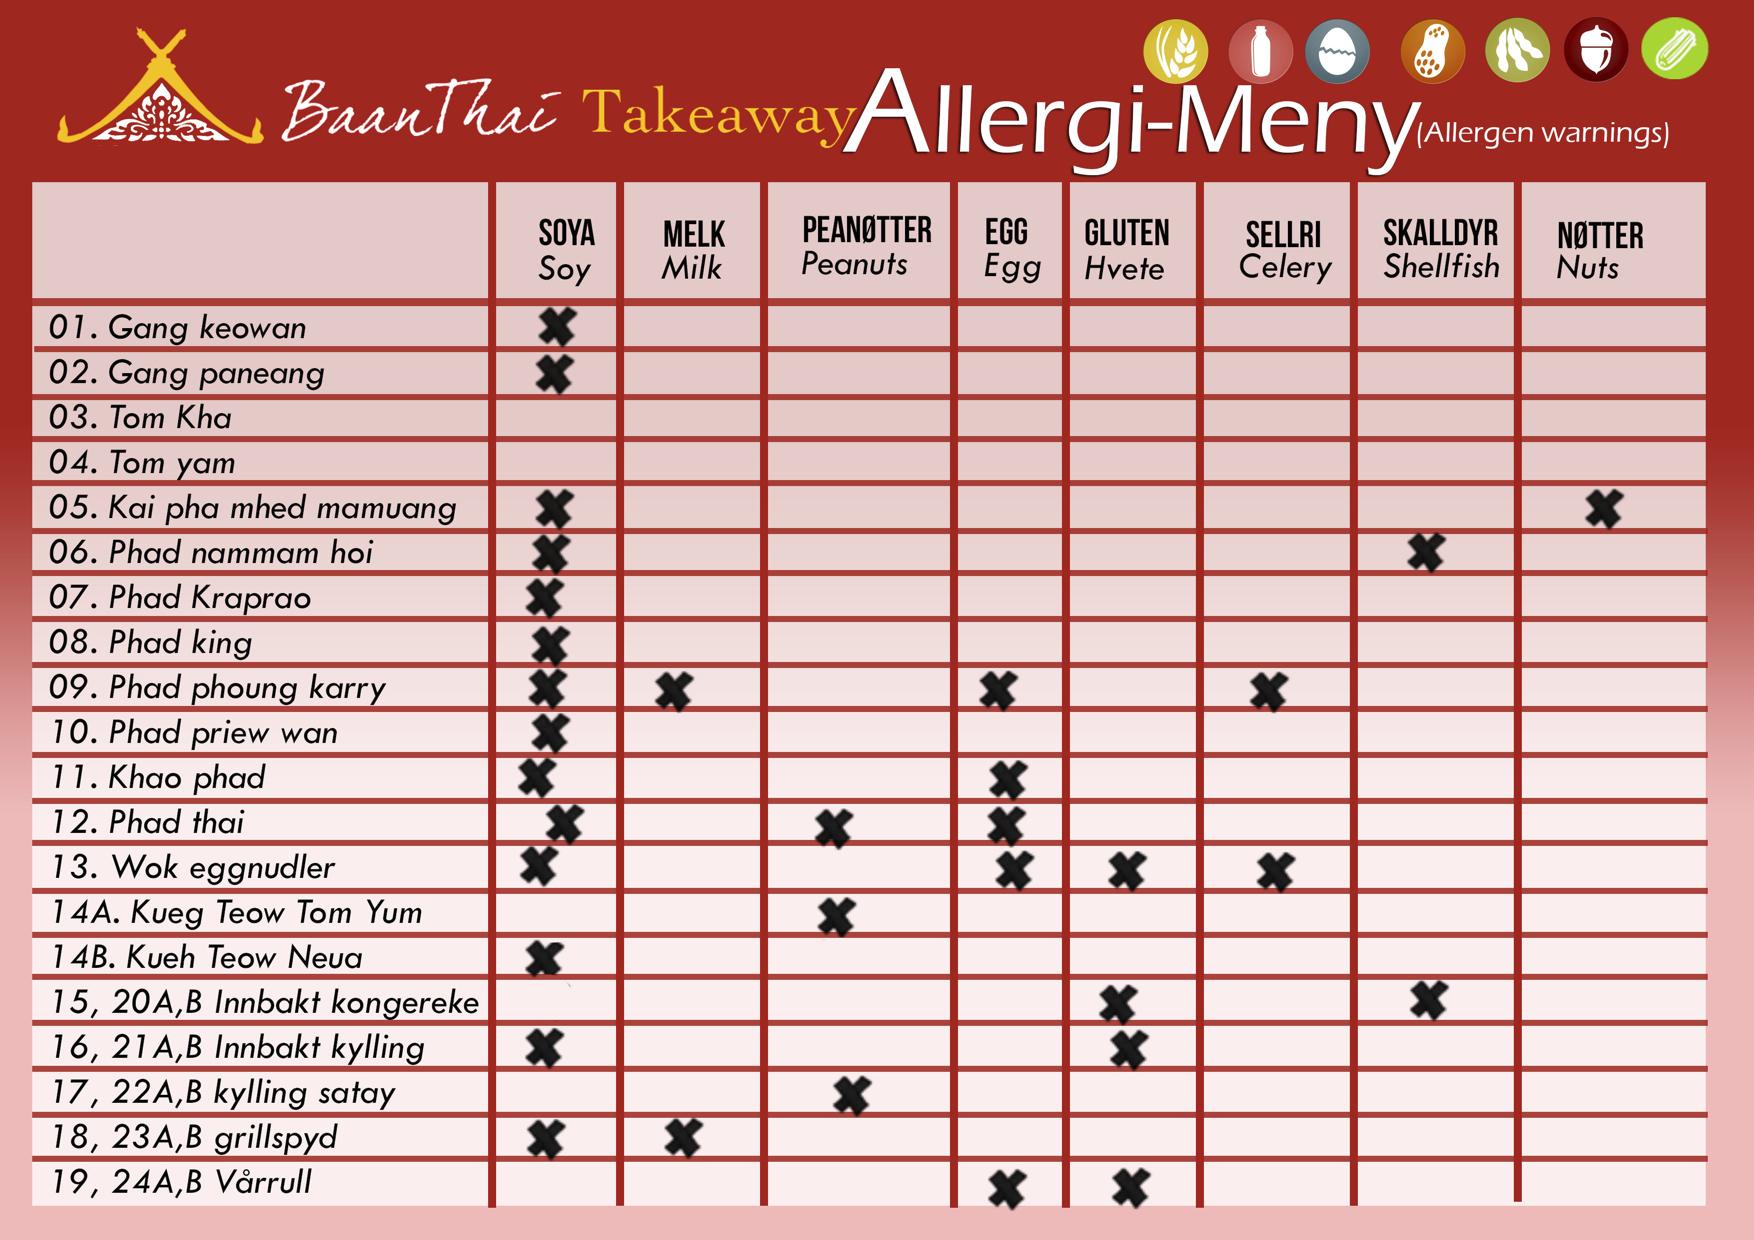 allergimeny